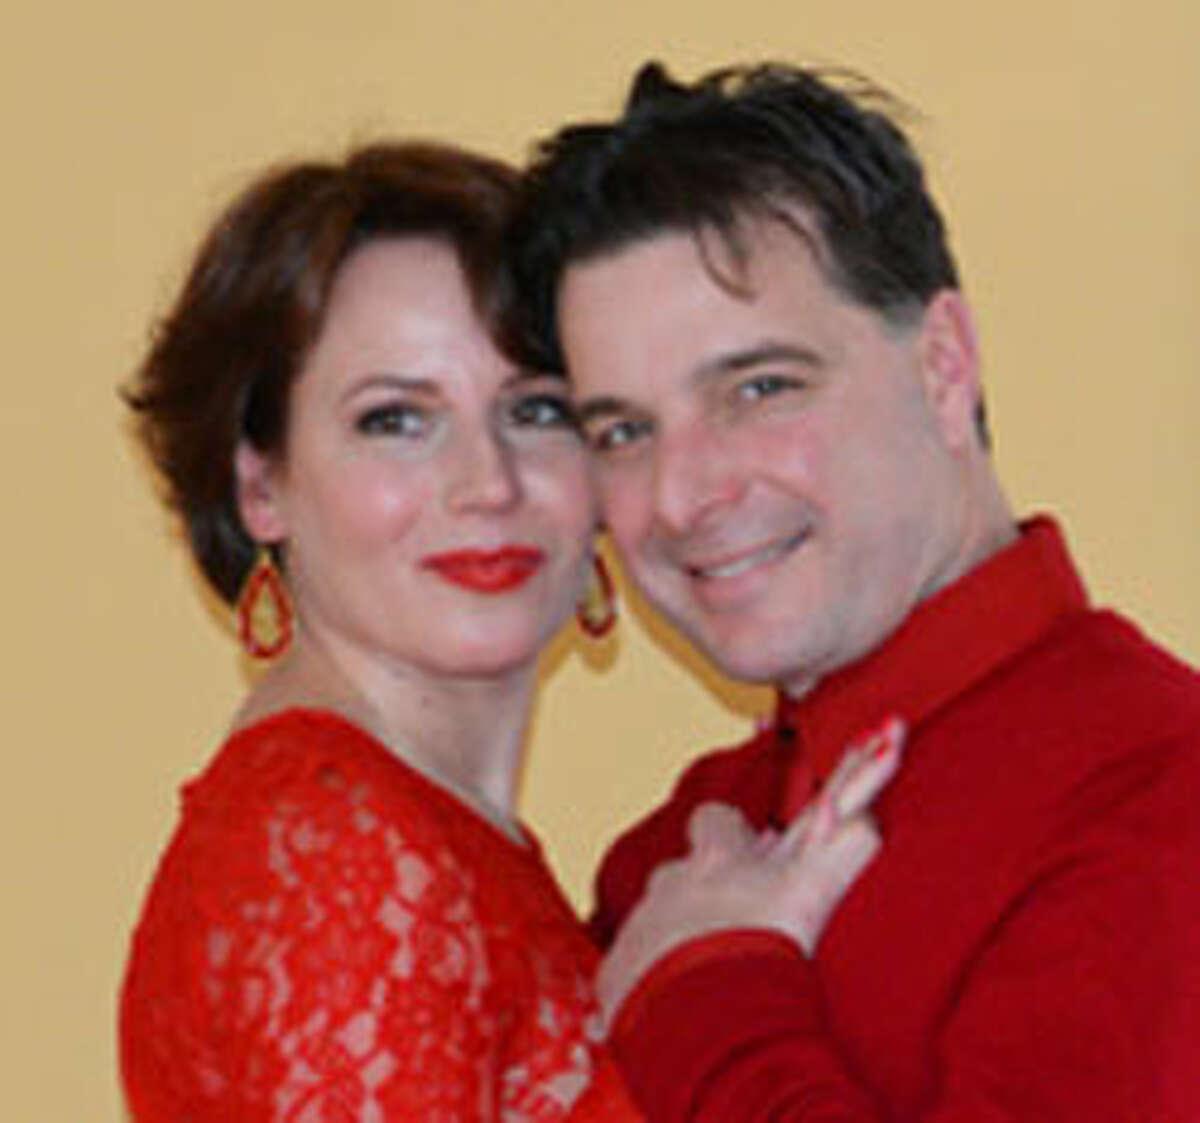 Monika Barska and fiancé Henry Skopp